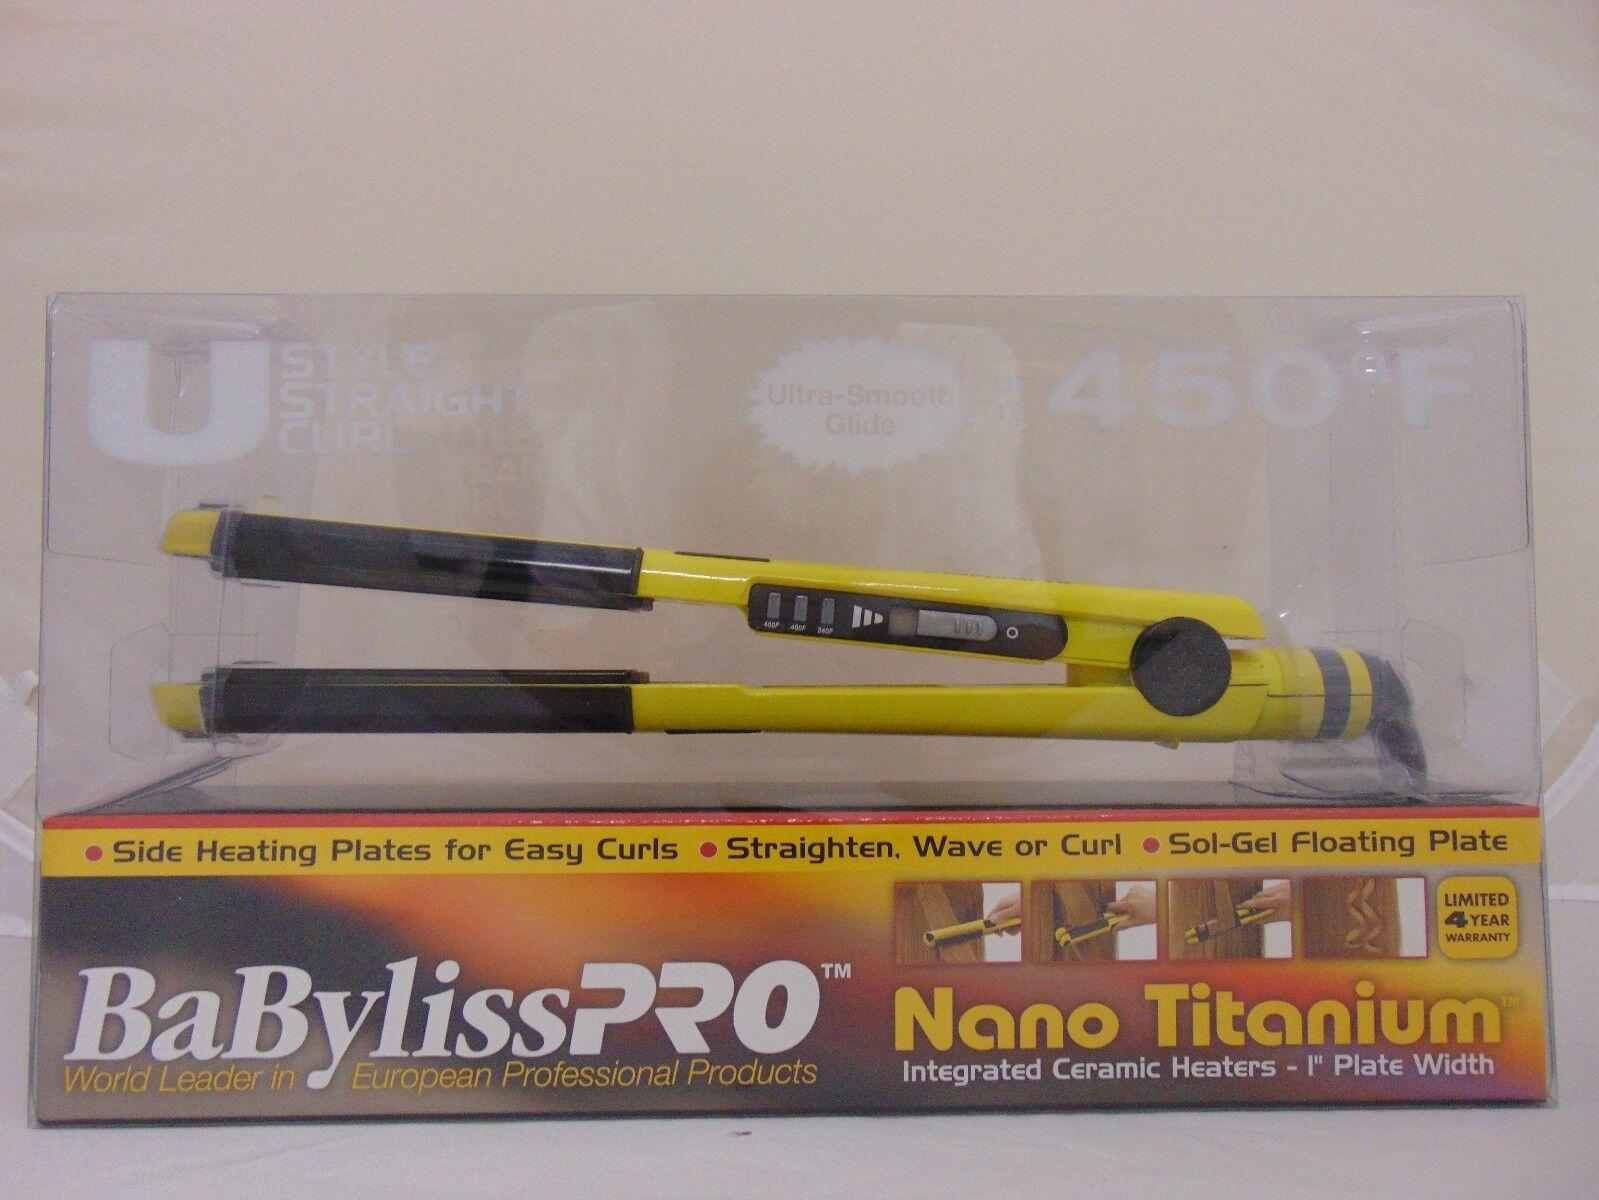 "BaByliss Pro Italia Brava Nano Titanium U-Styler 1"" - BABY20"